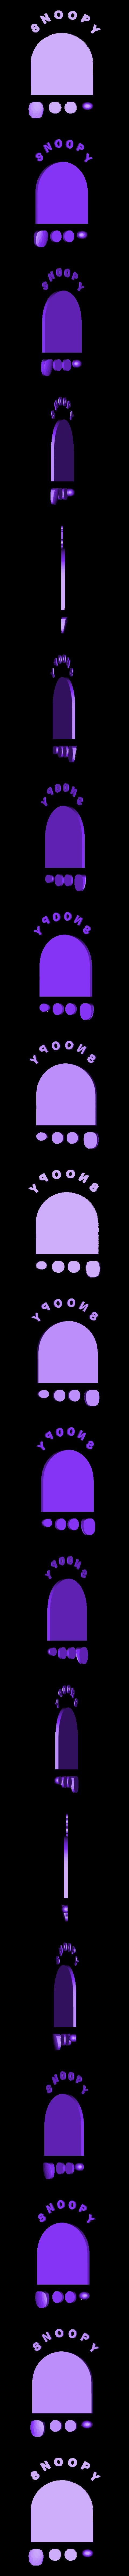 Snoopy_vs_Red_Baron-black_pieces.stl Download free STL file Snoopy vs Red Baron Bank (Compilation/remix) • 3D print template, lowboydrvr